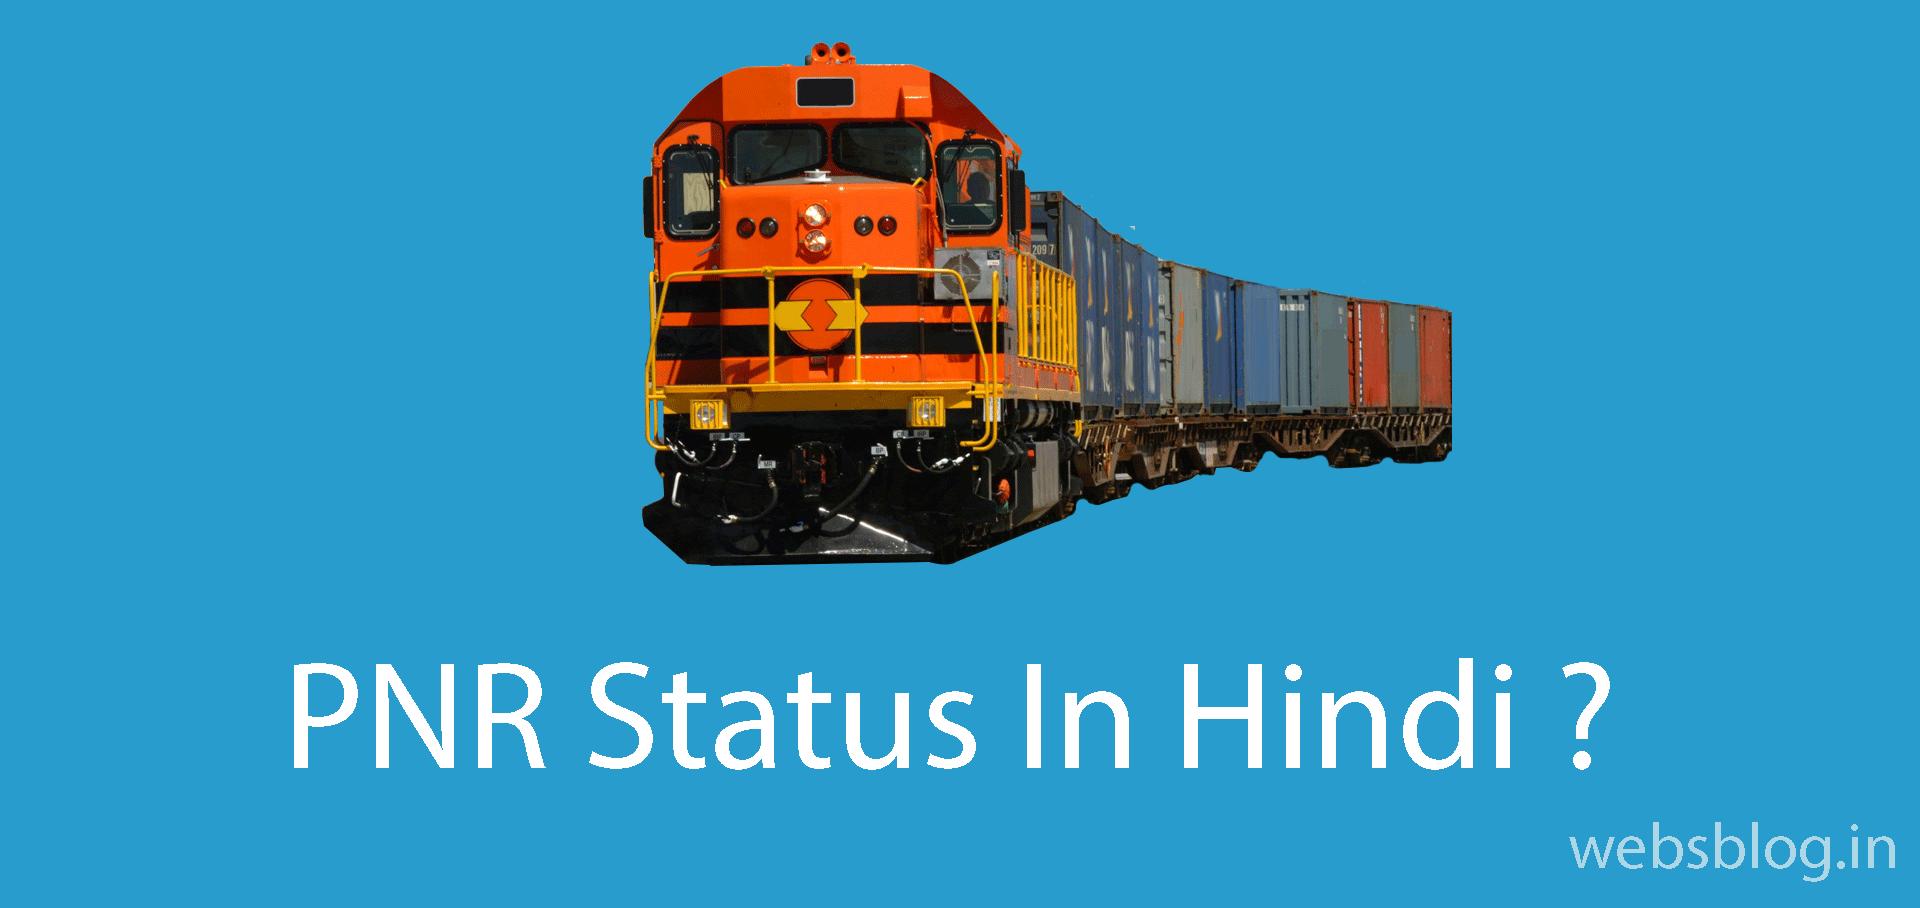 pnr-status-in-hindi